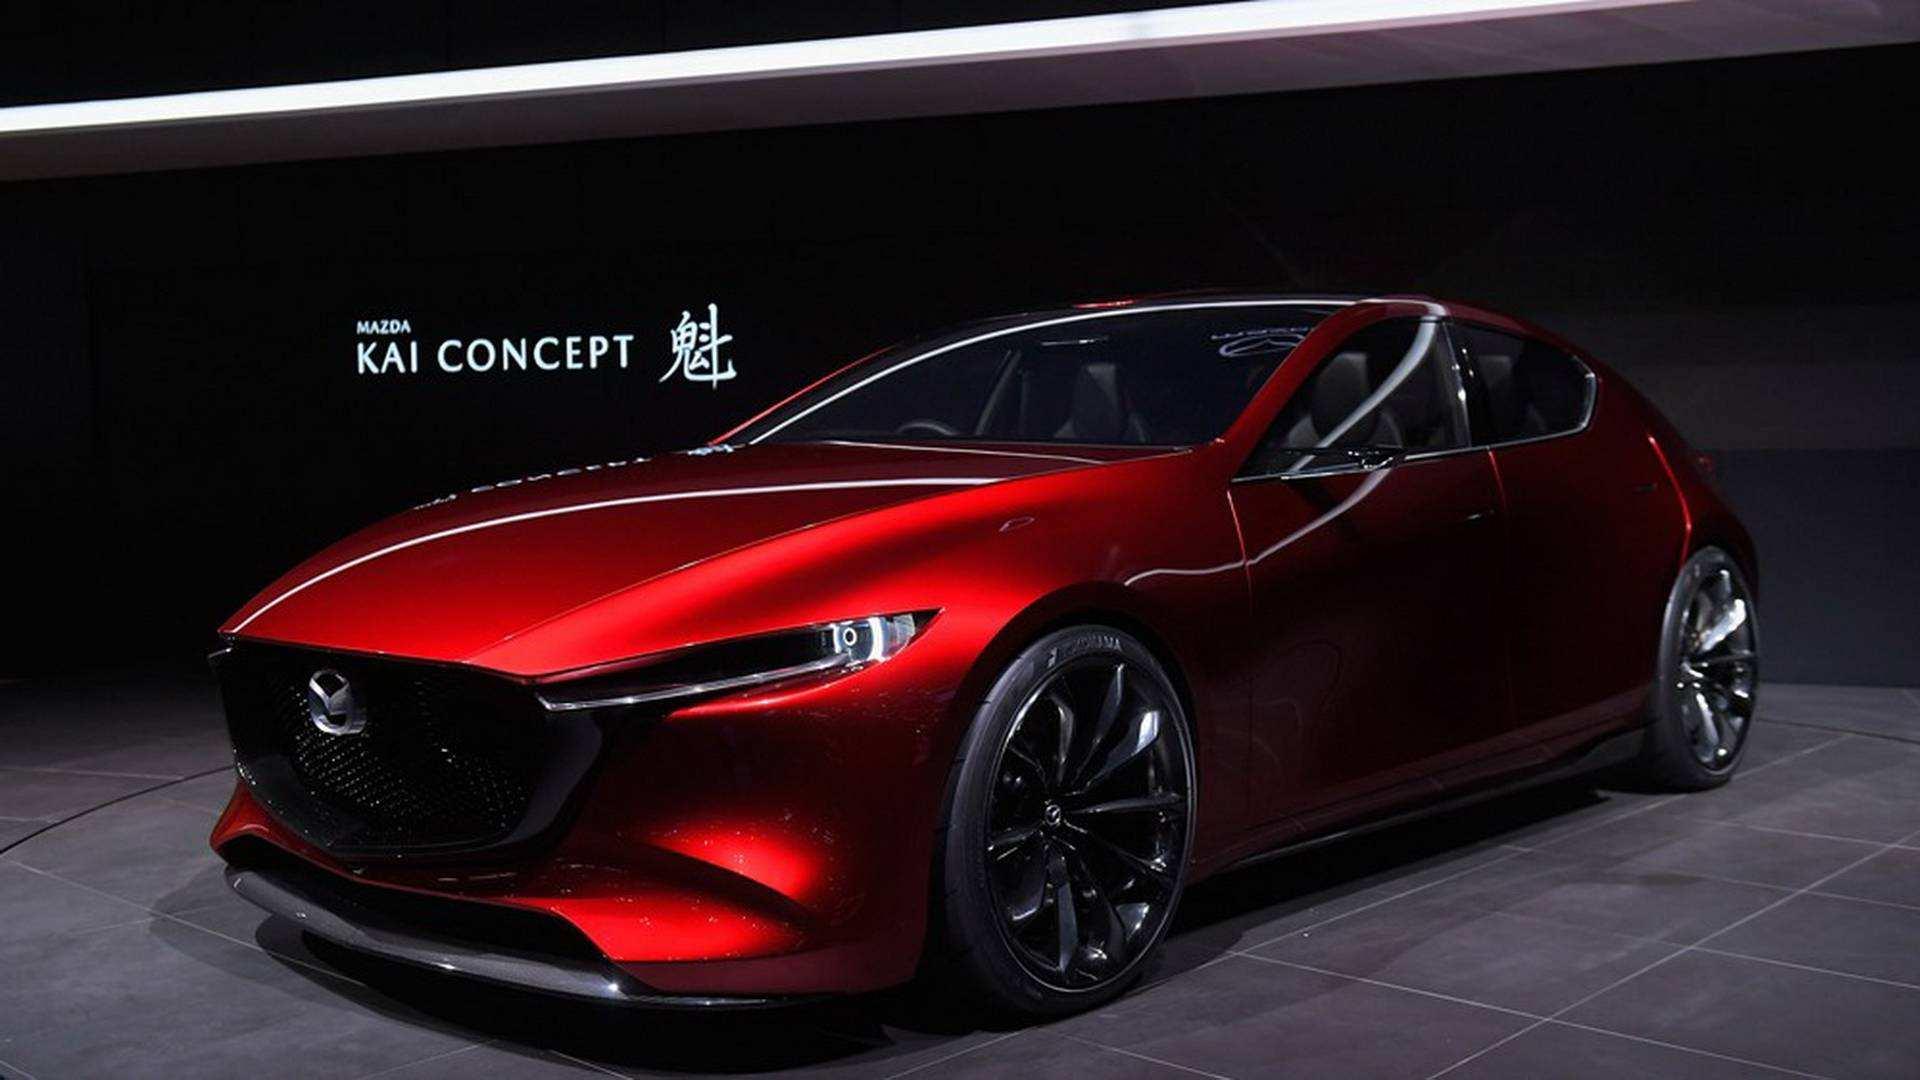 85 New Mazda 2020 Kai Performance and New Engine for Mazda 2020 Kai